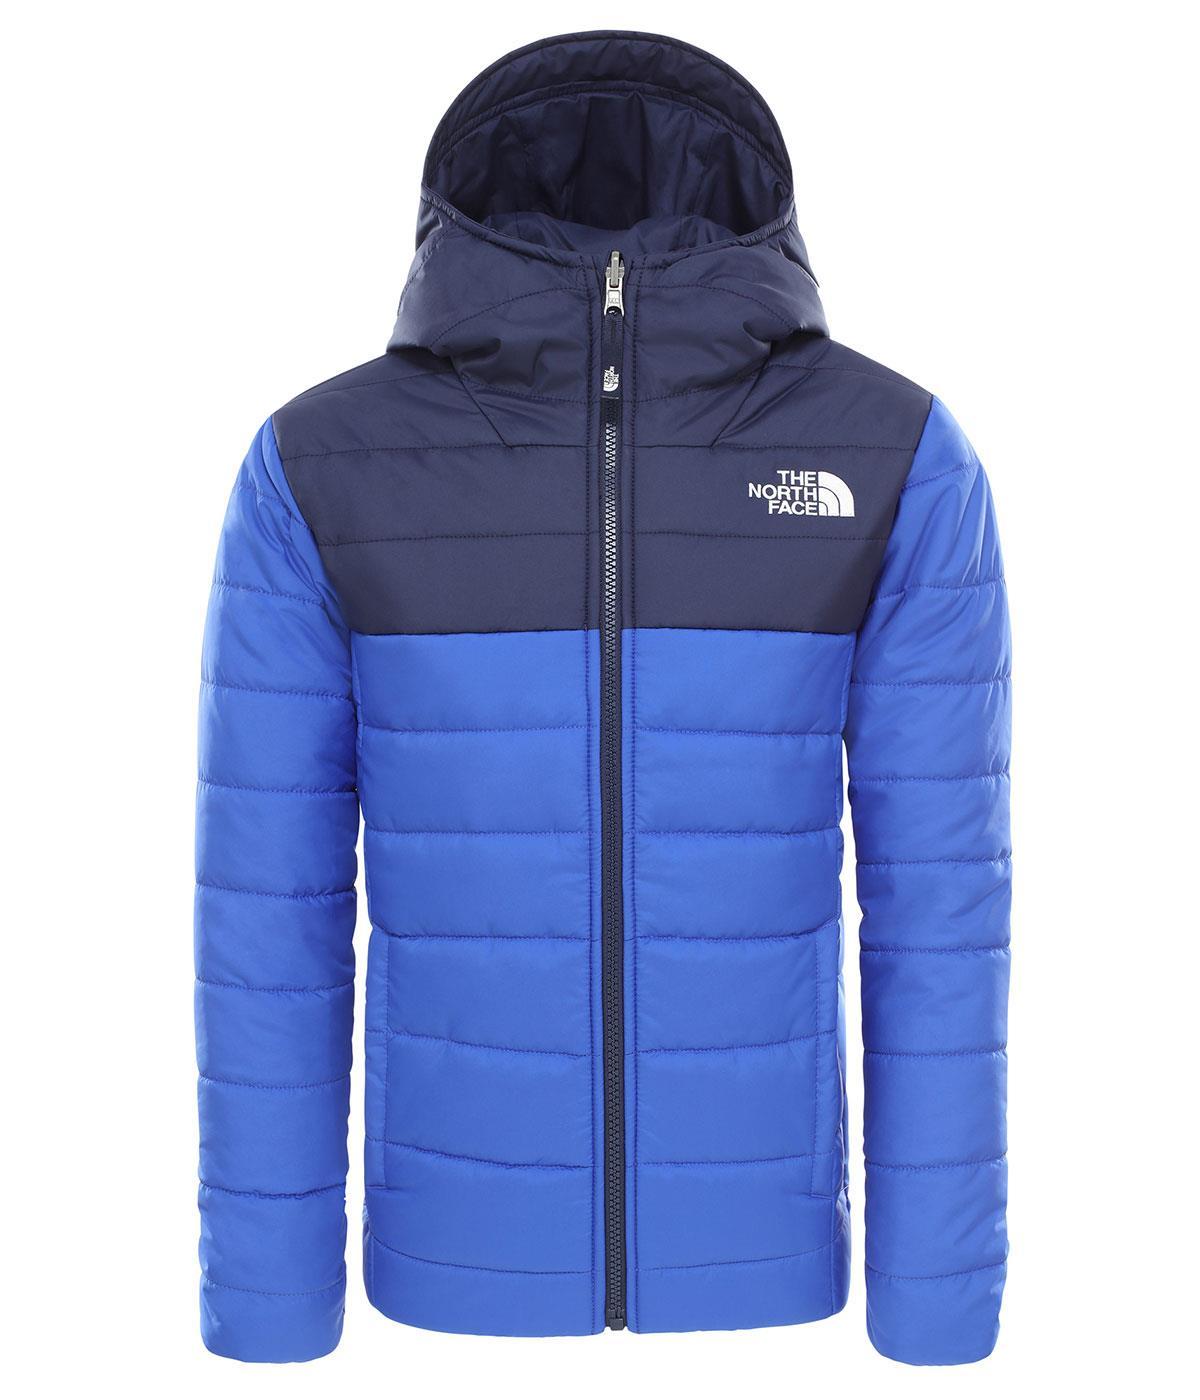 The North Face Erkek Çocuk  Rev Perrito ceket nf0A3Cq2Cz61